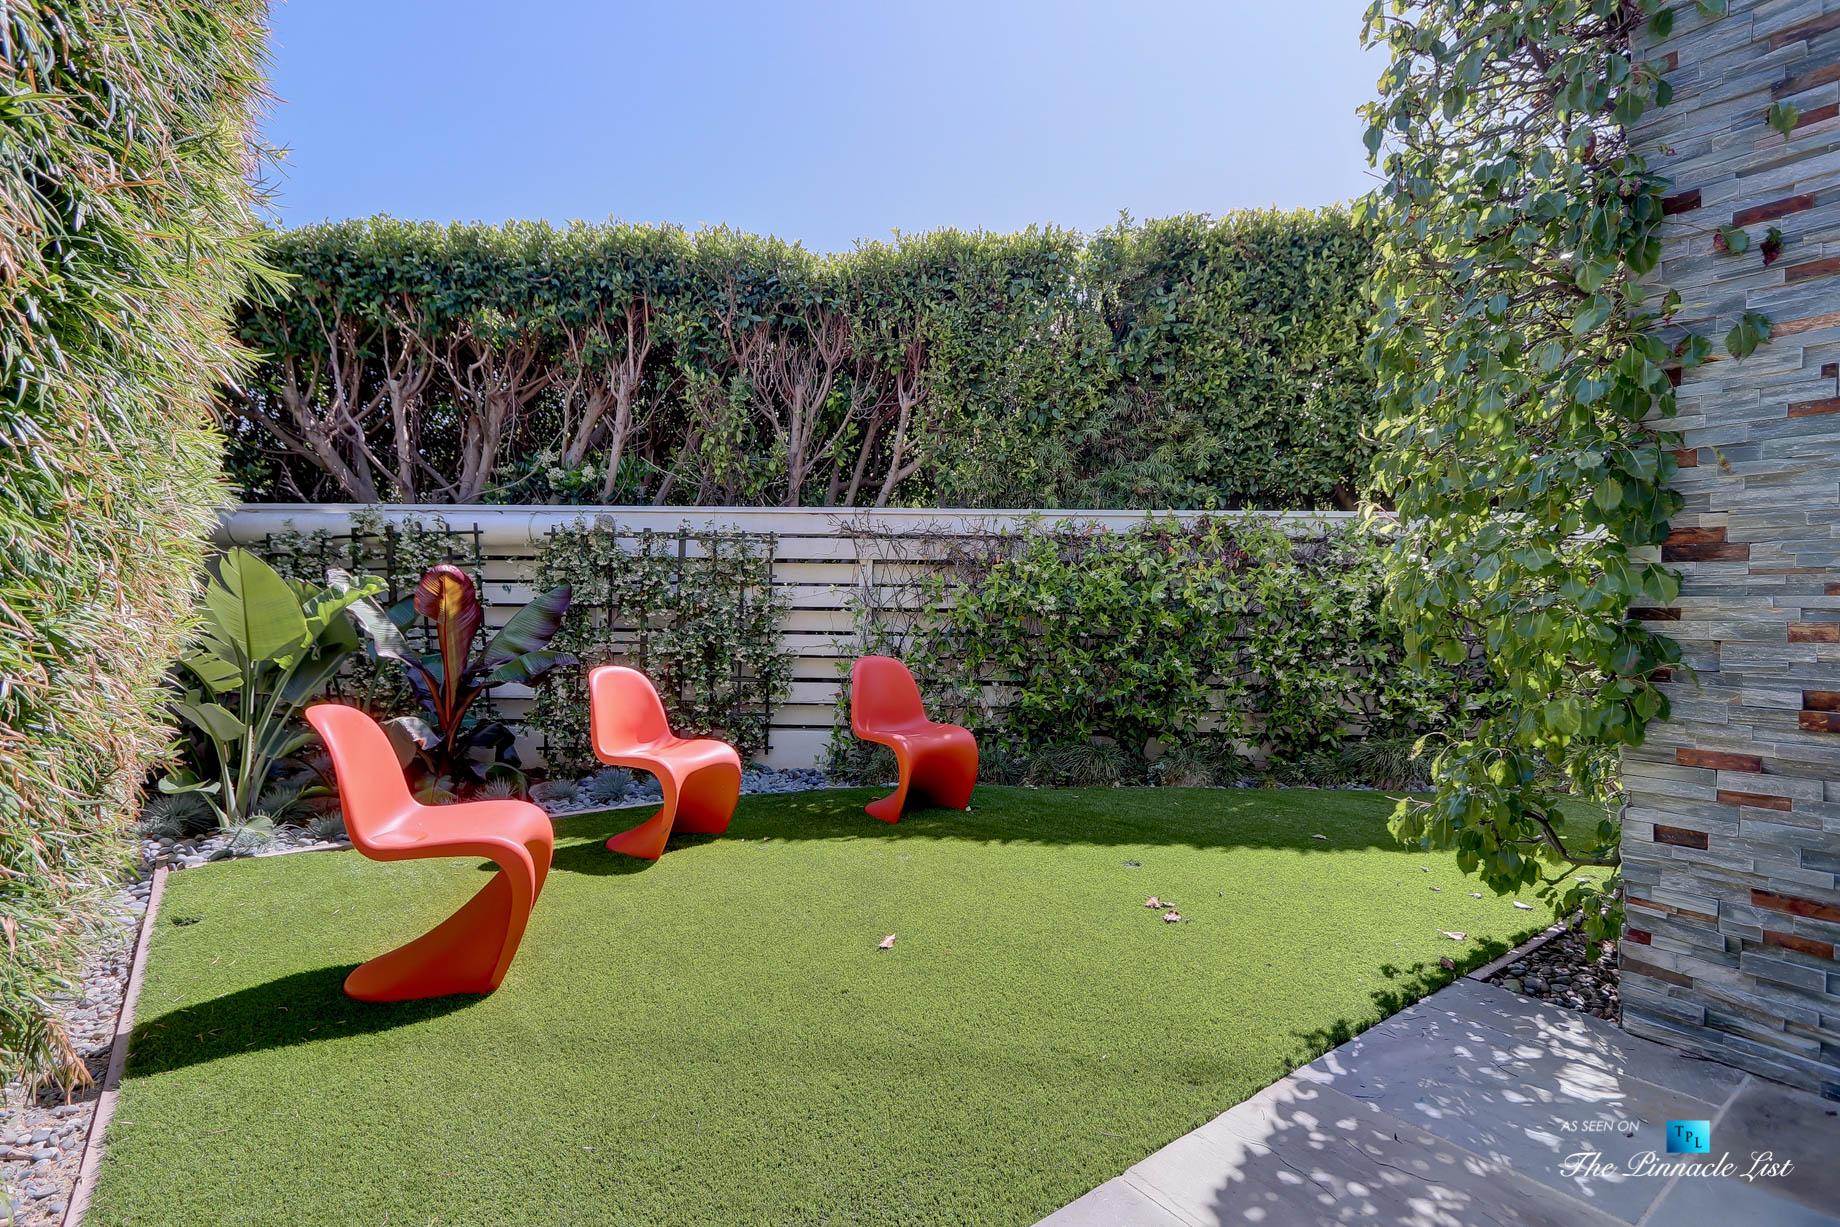 Tree Section Modern Farmhouse - 570 27th Street, Manhattan Beach, CA, USA - Backyard Seating